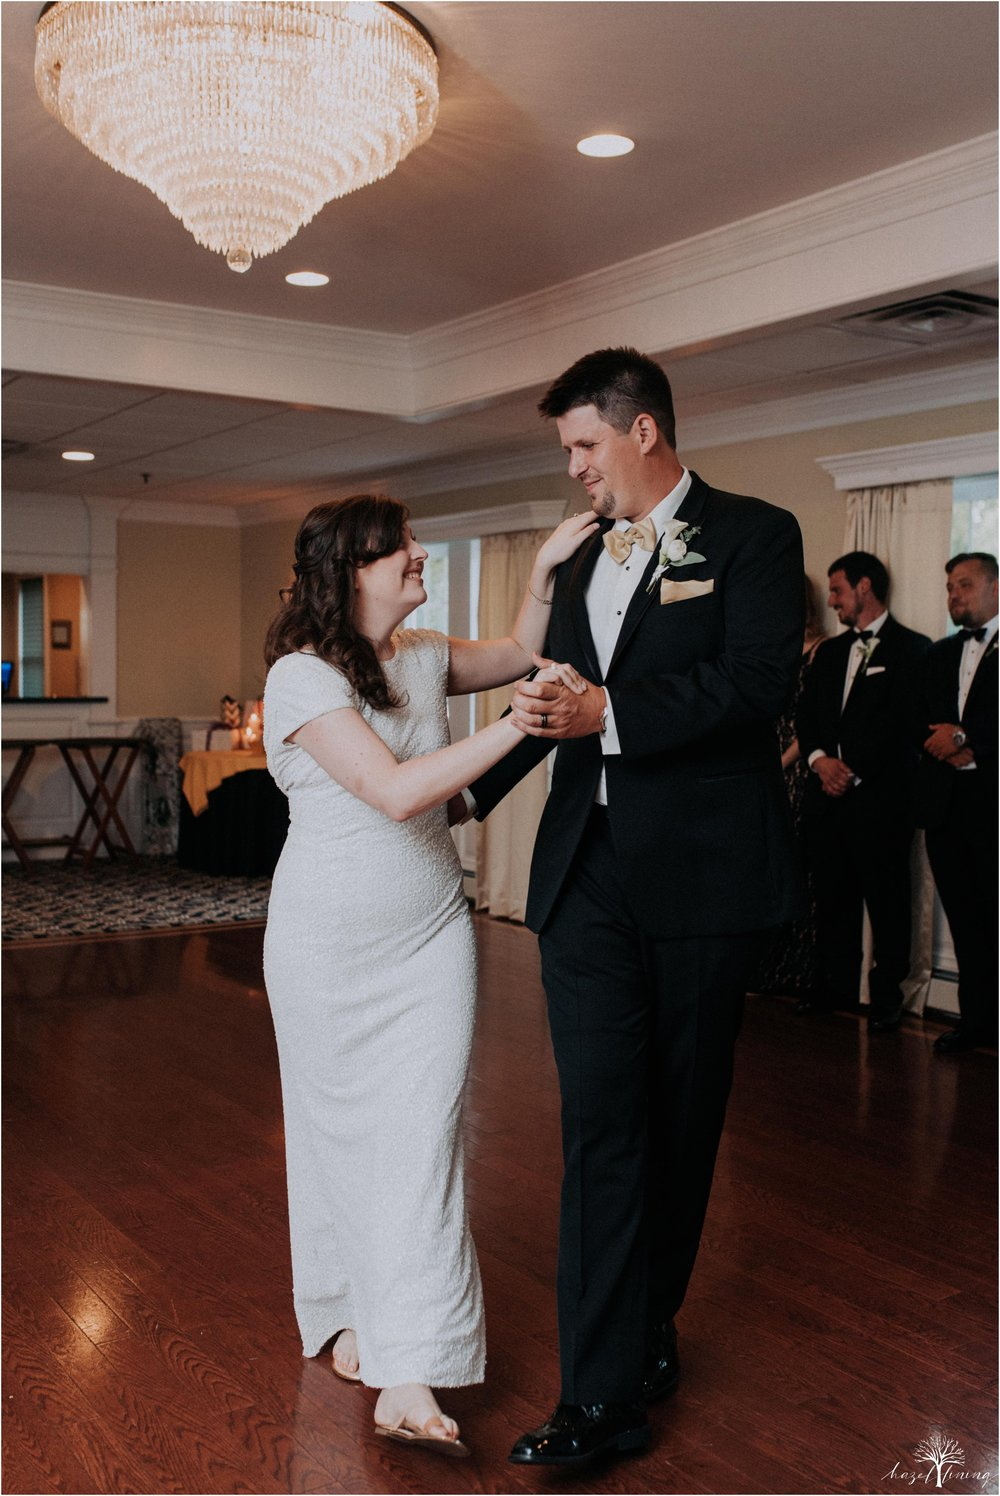 elizabeth-doelp-andrew-foreback-middletown-country-club-summer-langhorne-pennsylvania-wedding-hazel-lining-travel-wedding-elopement-photography_0128.jpg